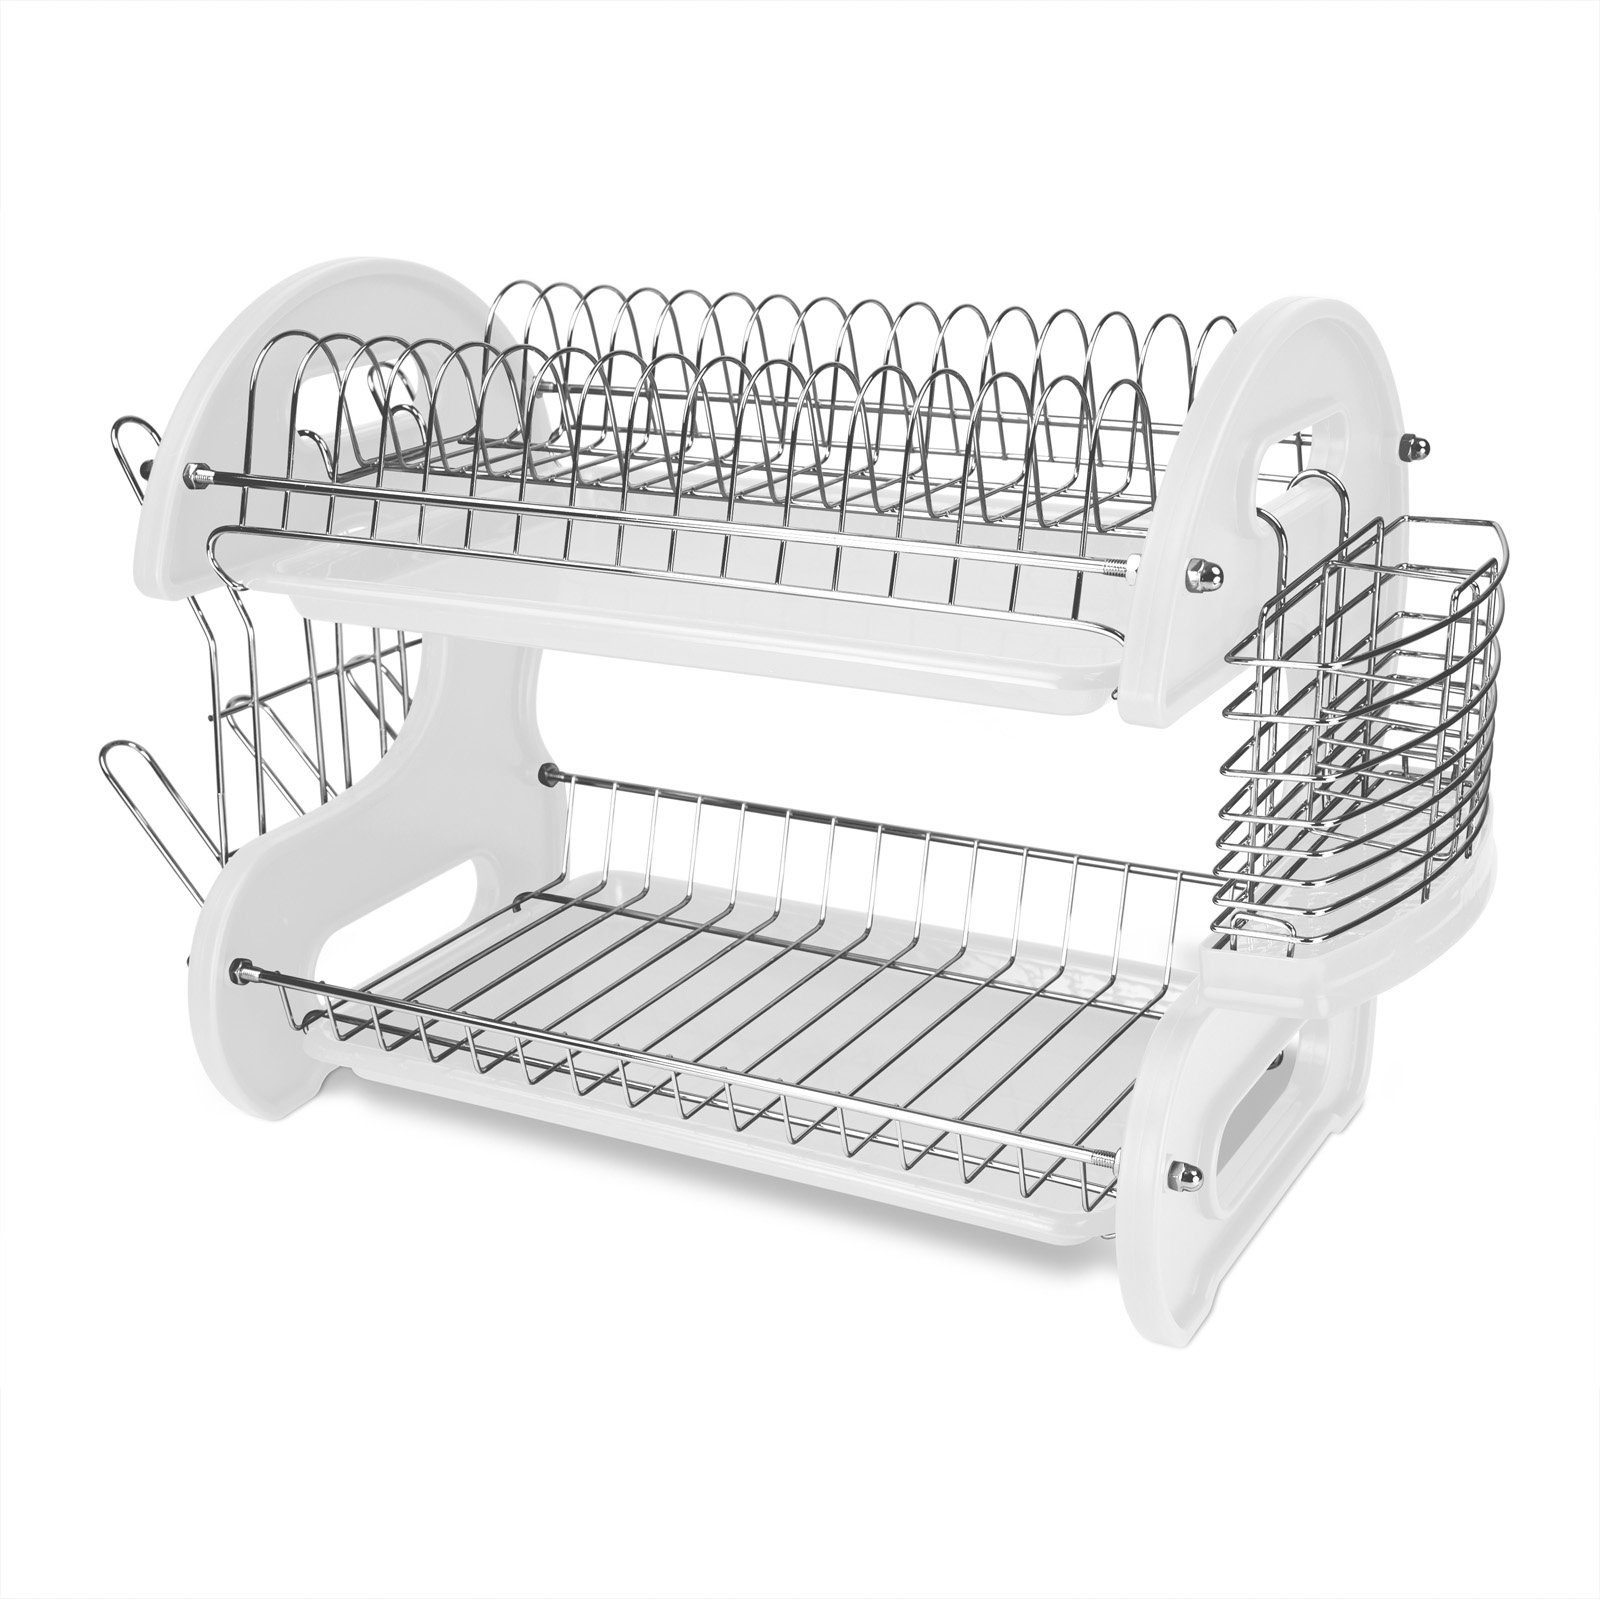 Home Basics 2 Tier Plastic Dish Drainer White Walmart Com